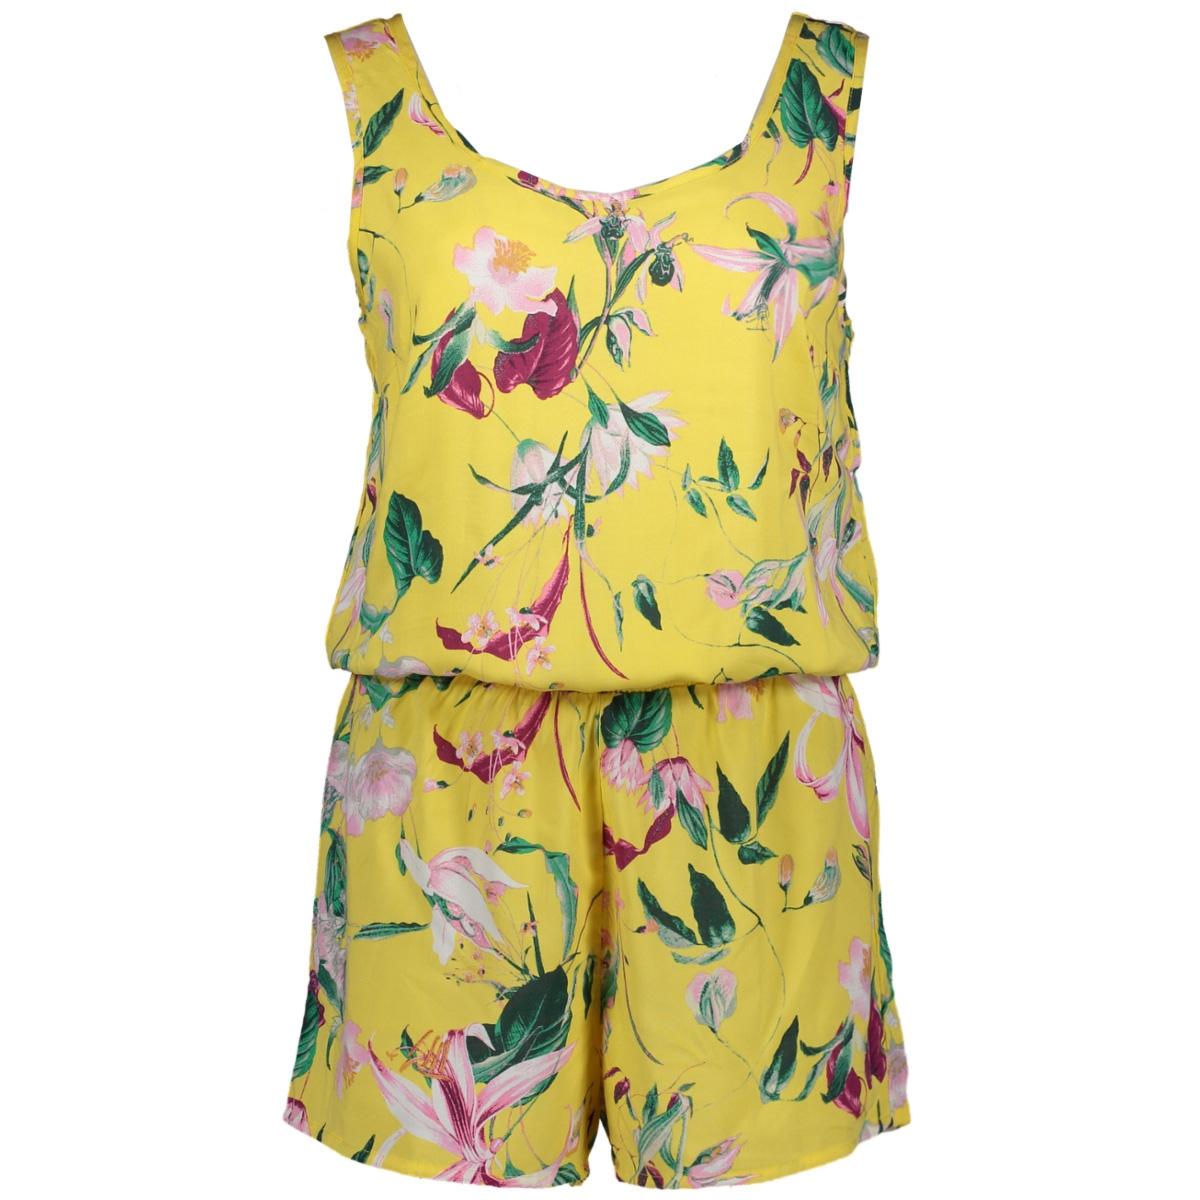 vmsimply easy sl playsuit 10211492 vero moda jumpsuit yarrow/trille-y